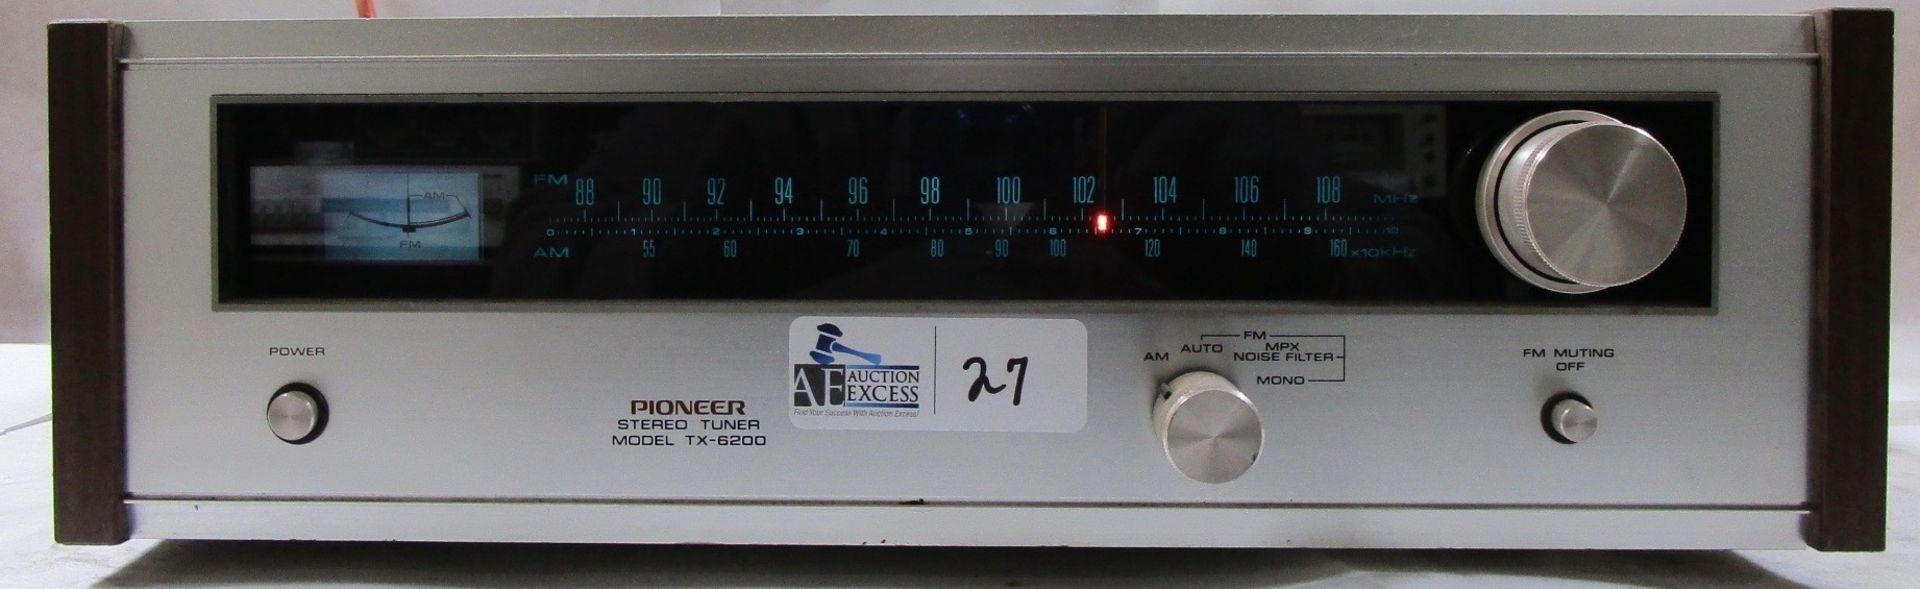 Lot 27 - PIONEER TX-6200 TUNER